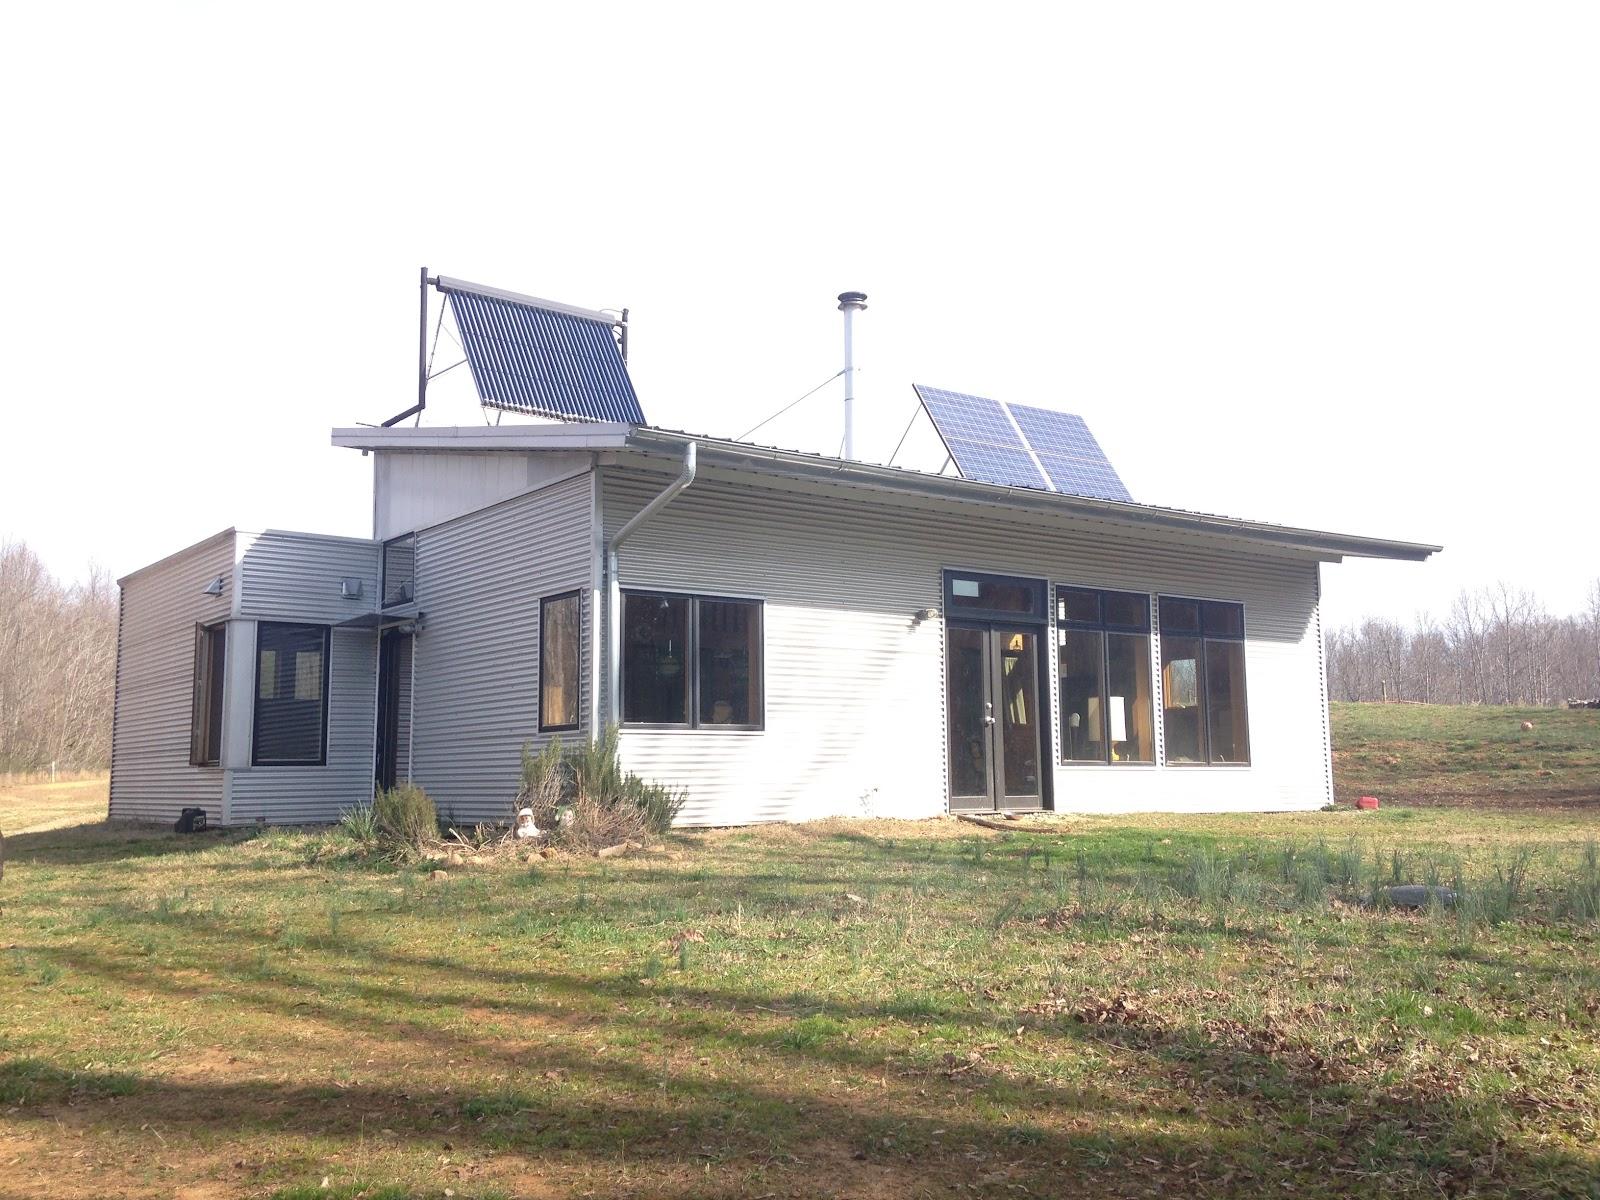 Modern Prefab House Off Grid Thinks On Concrete Slabs ...